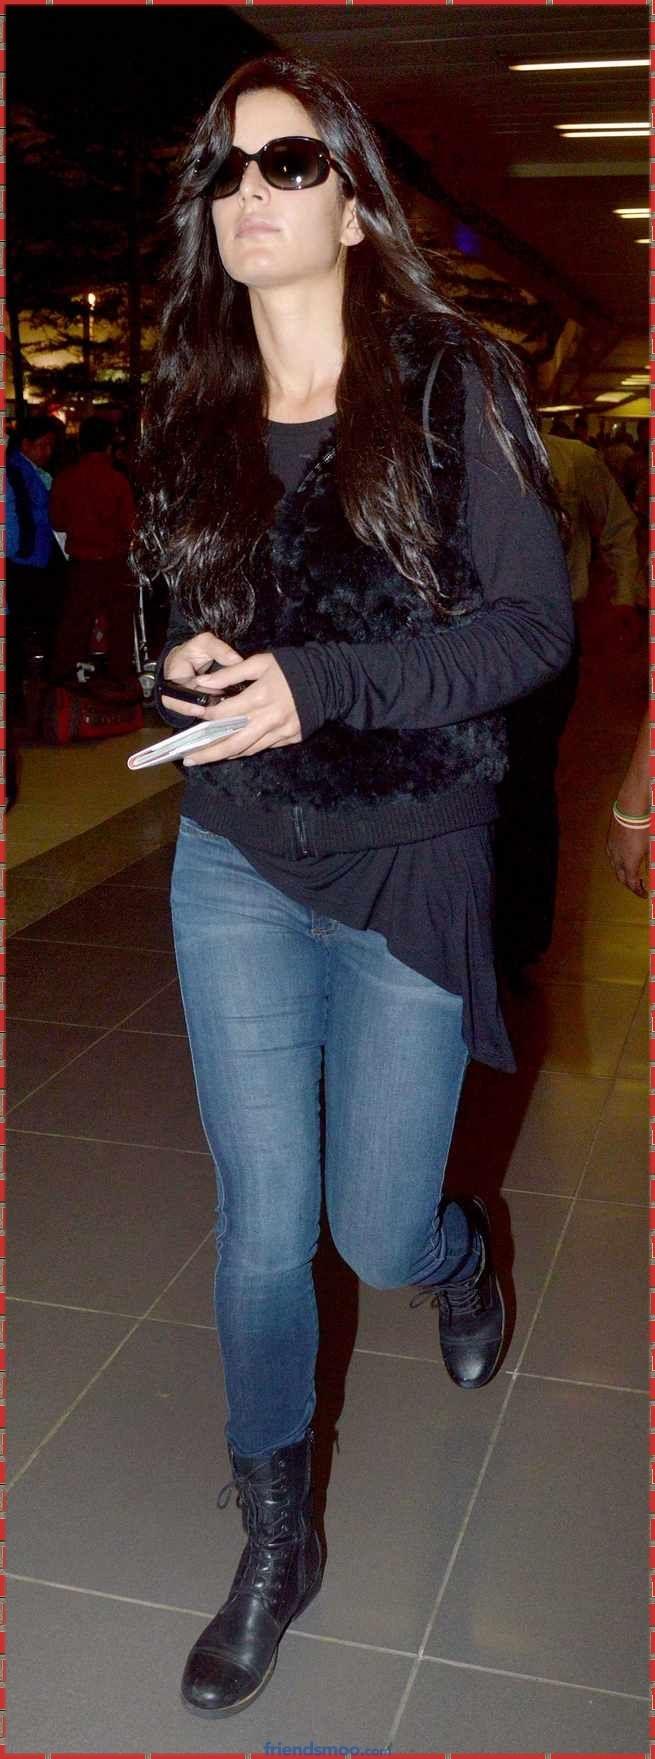 Katrina Kaif Latest Photos in Black Top and Blue Jeans (4 ...